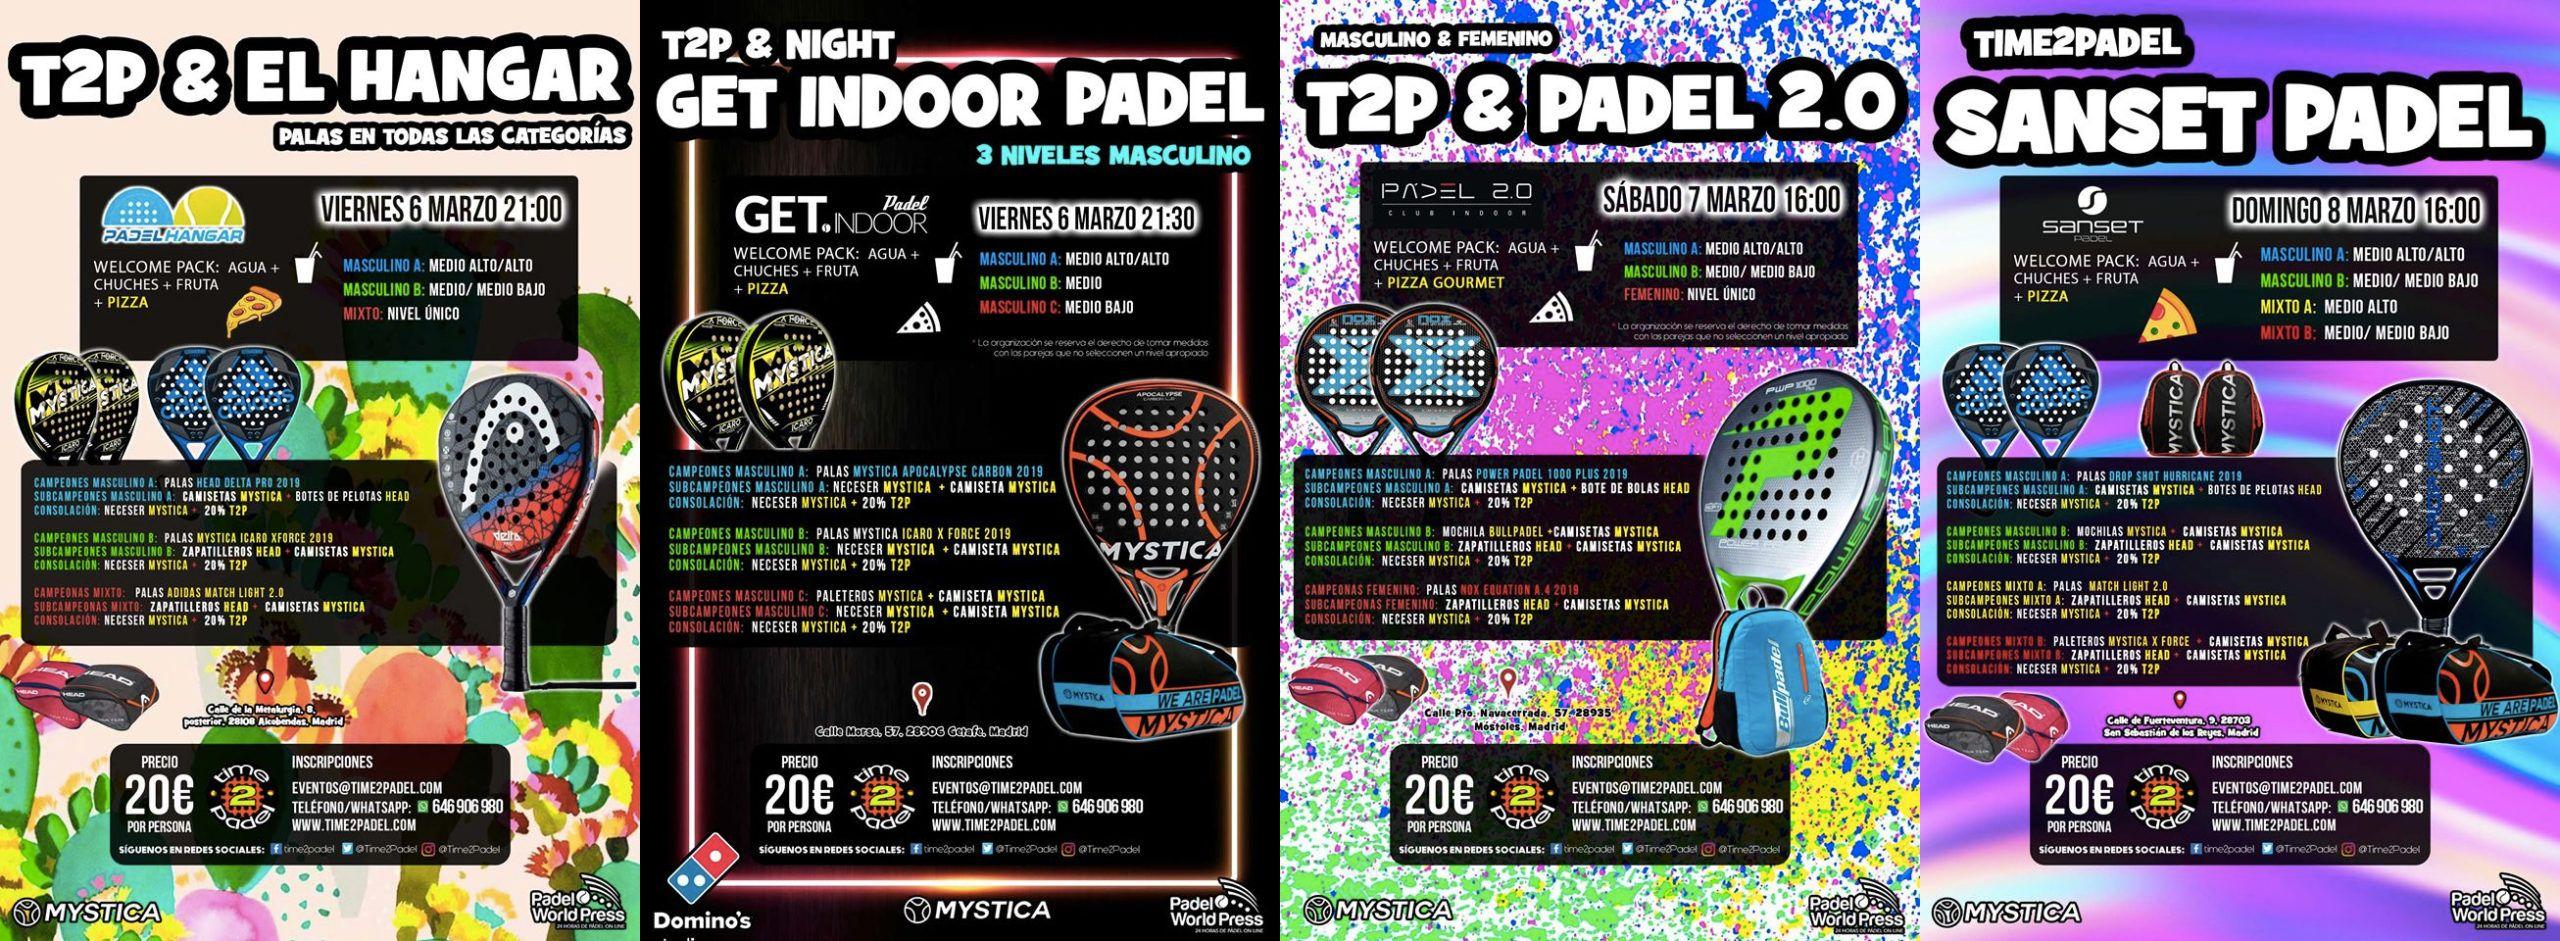 La proposta del torneo Time2Padel Tournament.